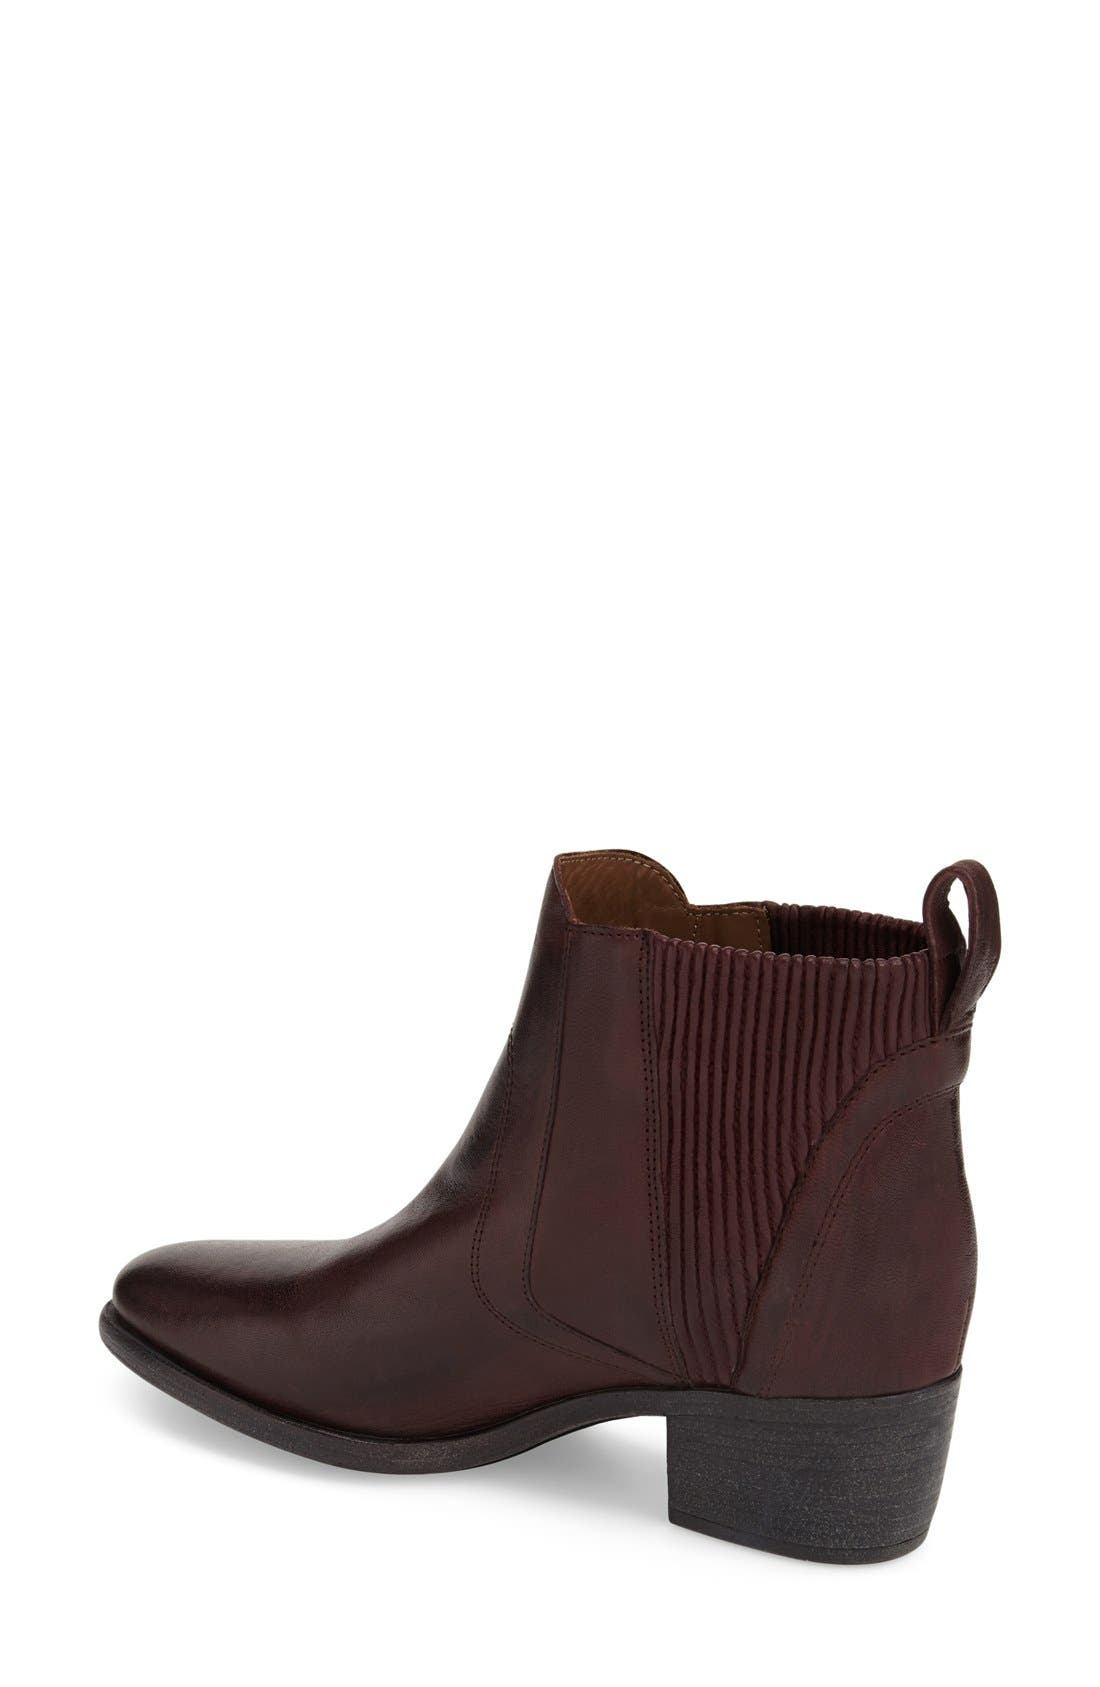 Alternate Image 2  - UGG® Collection 'Felisa' Boot (Women)